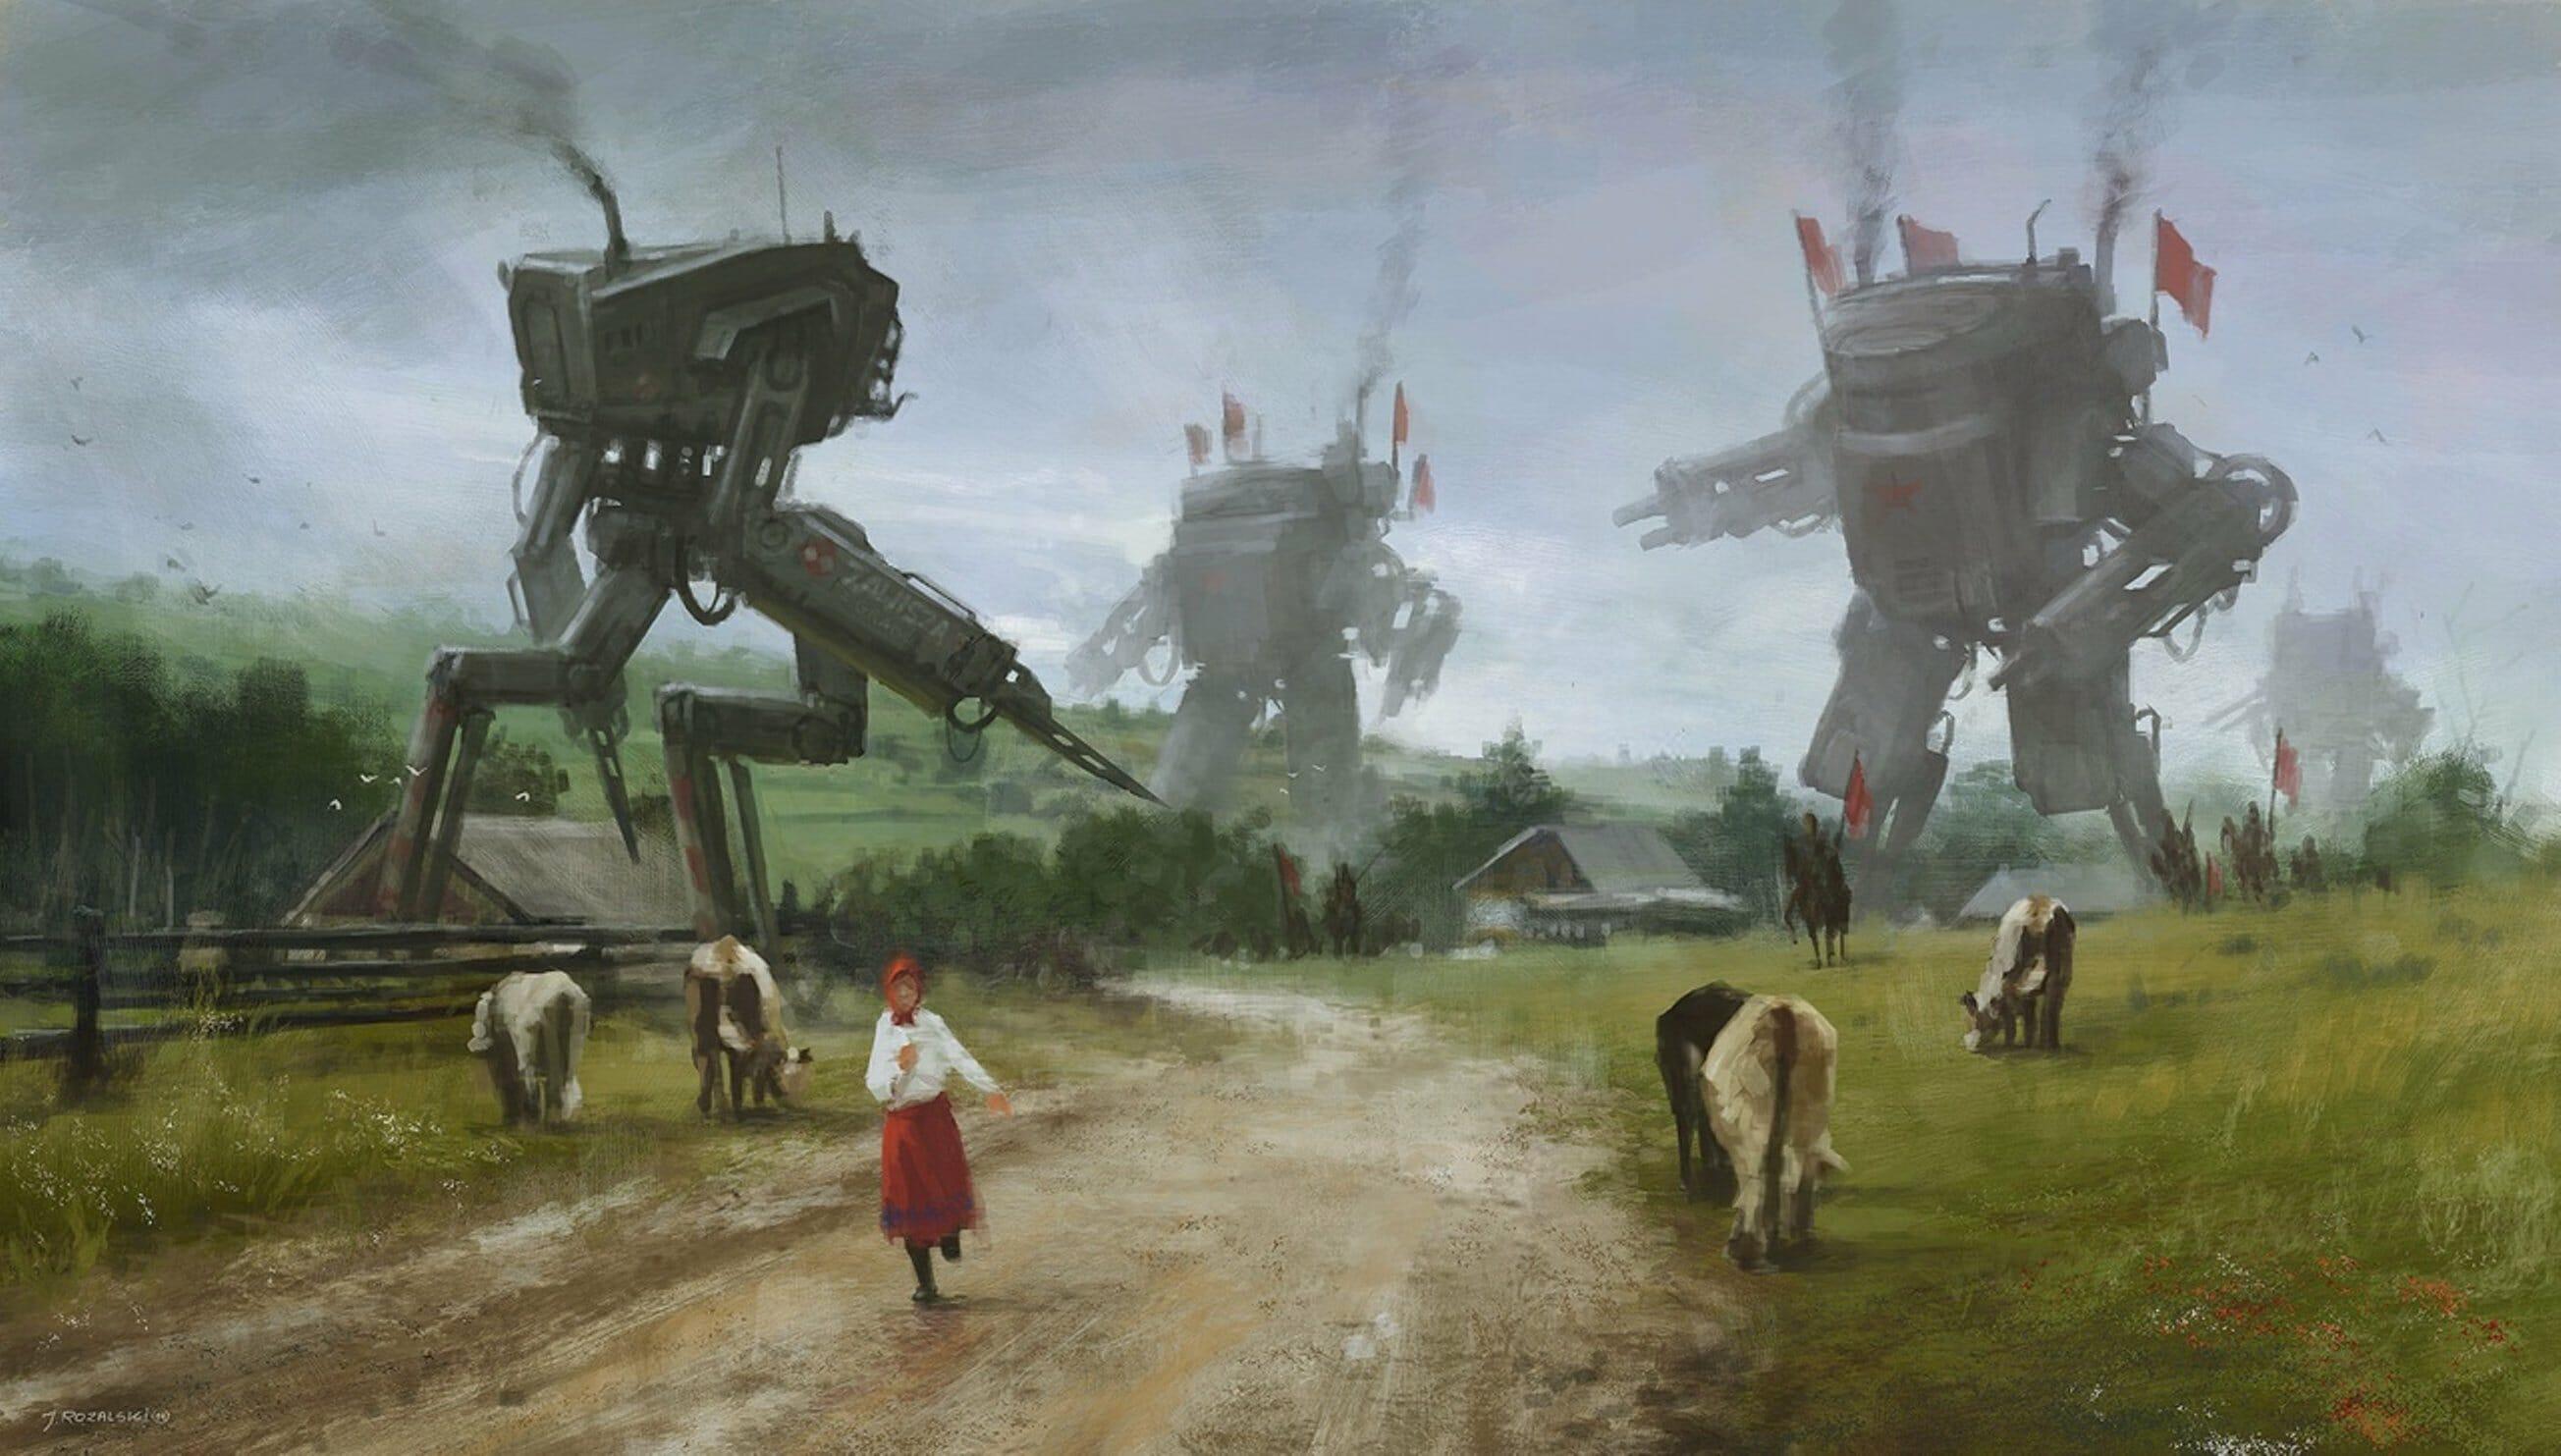 The sensational art of Jakub Różalski